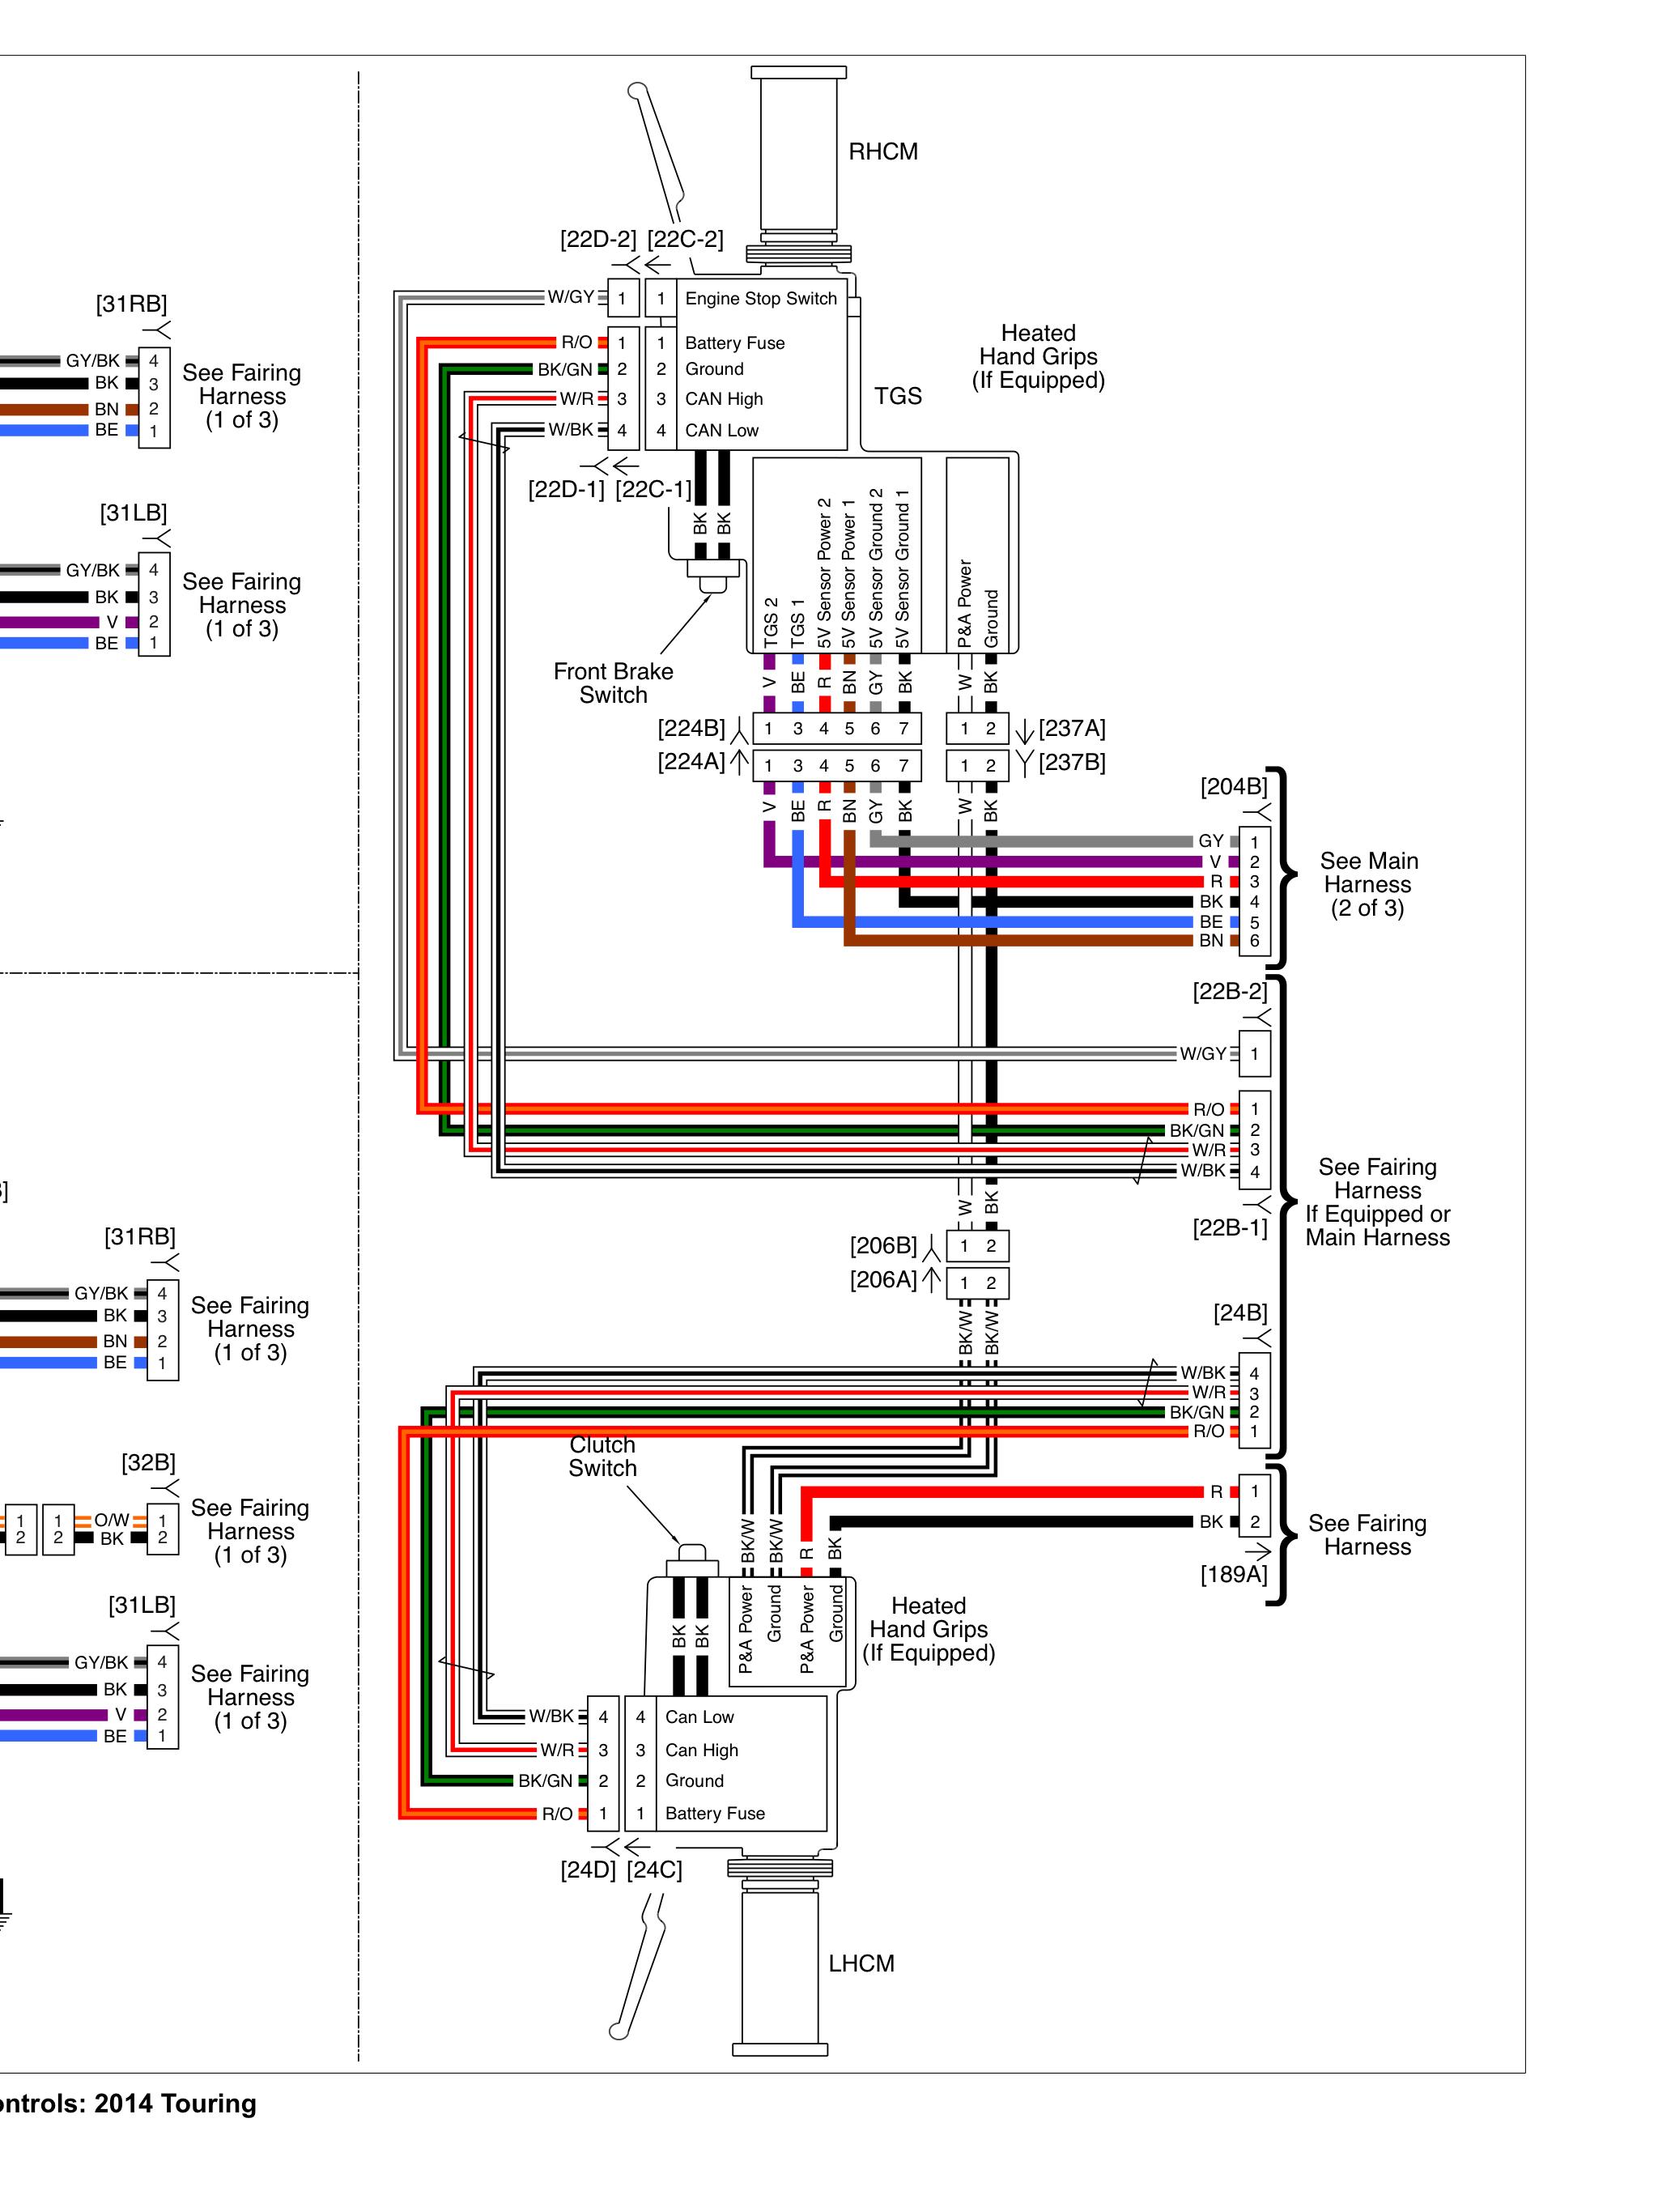 Diagram Gamecube Controller Wiring Diagram Right Stick Full Version Hd Quality Right Stick Diagramsshade Csarcheometria It